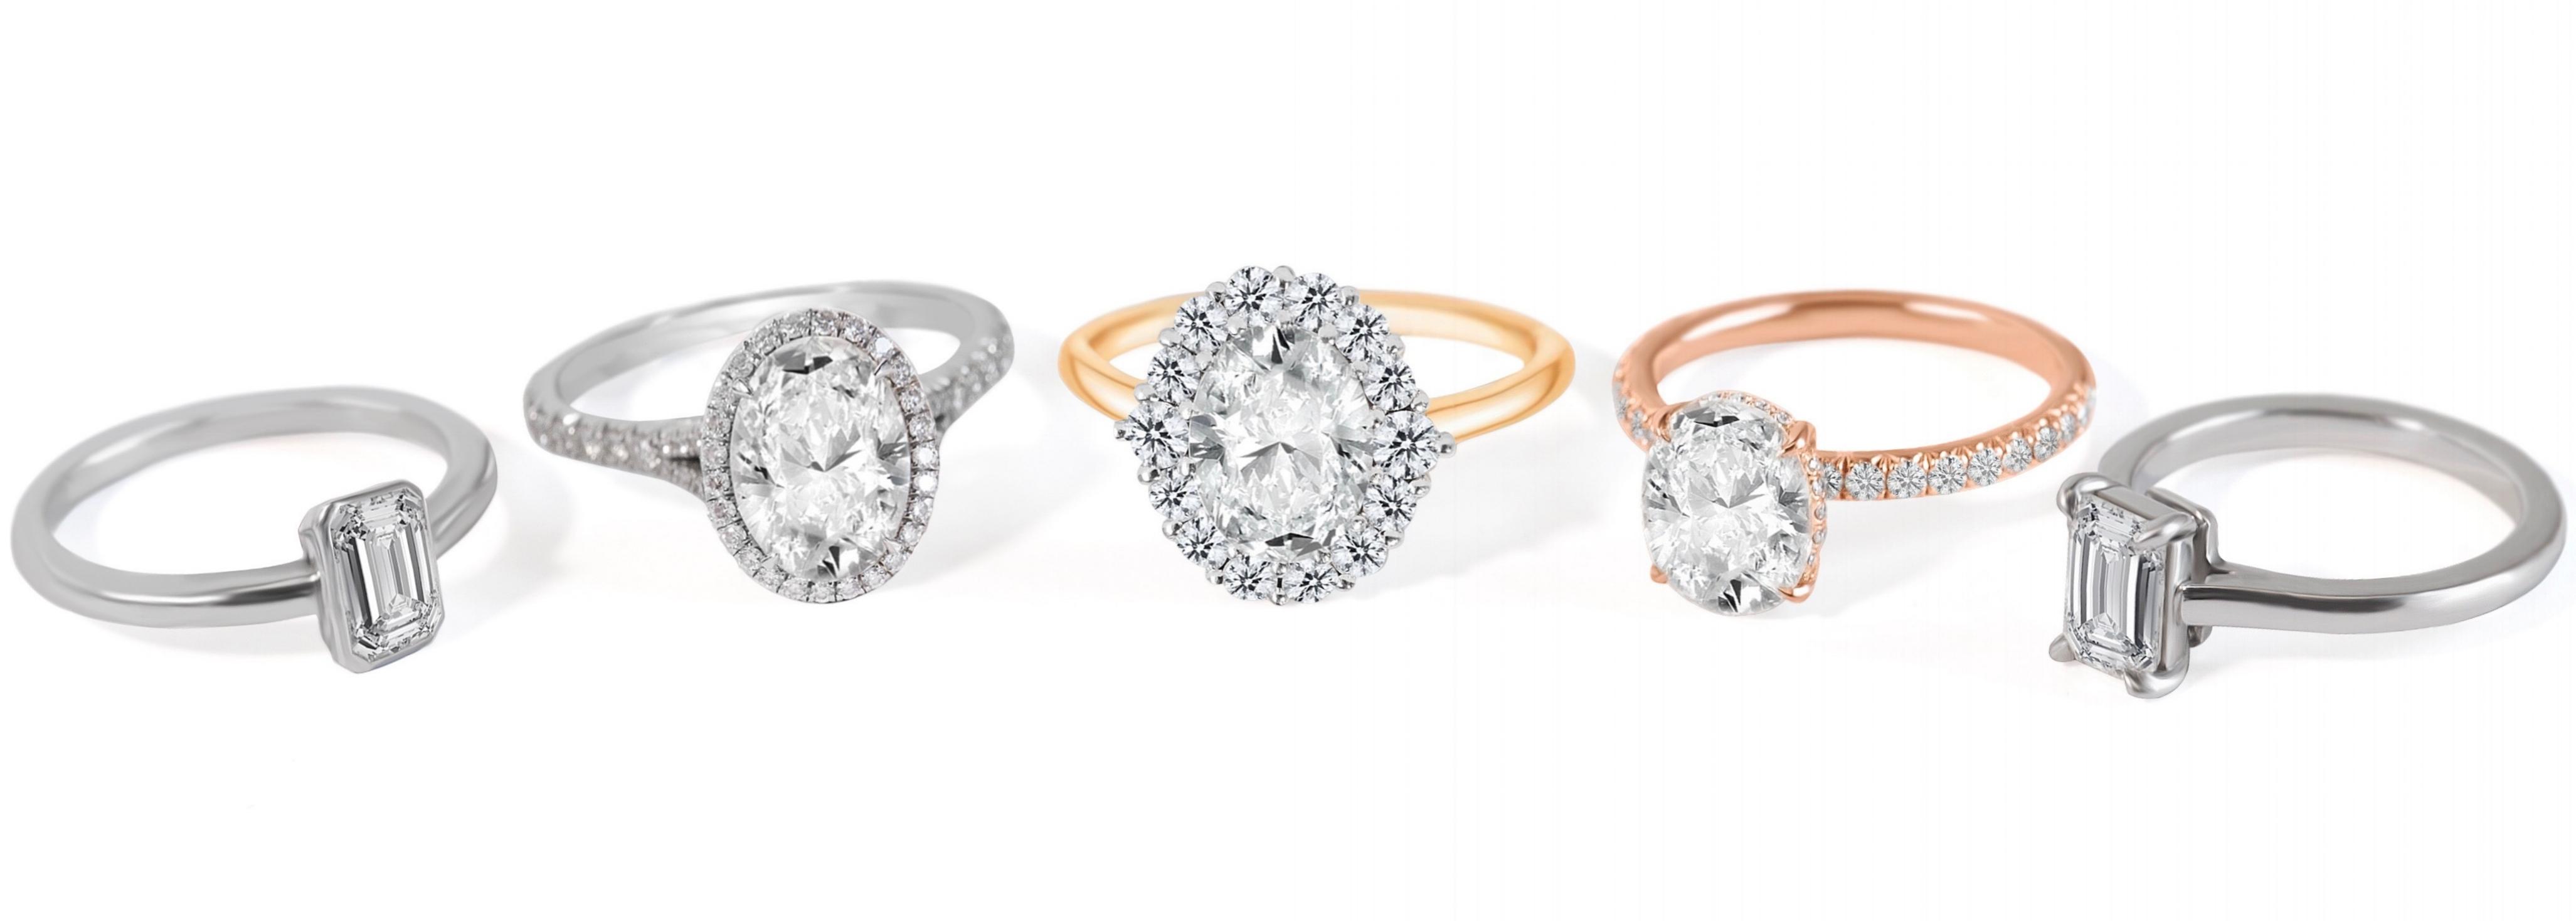 Start Your Own - Edelweiss Jewelry - Custom Design Plan